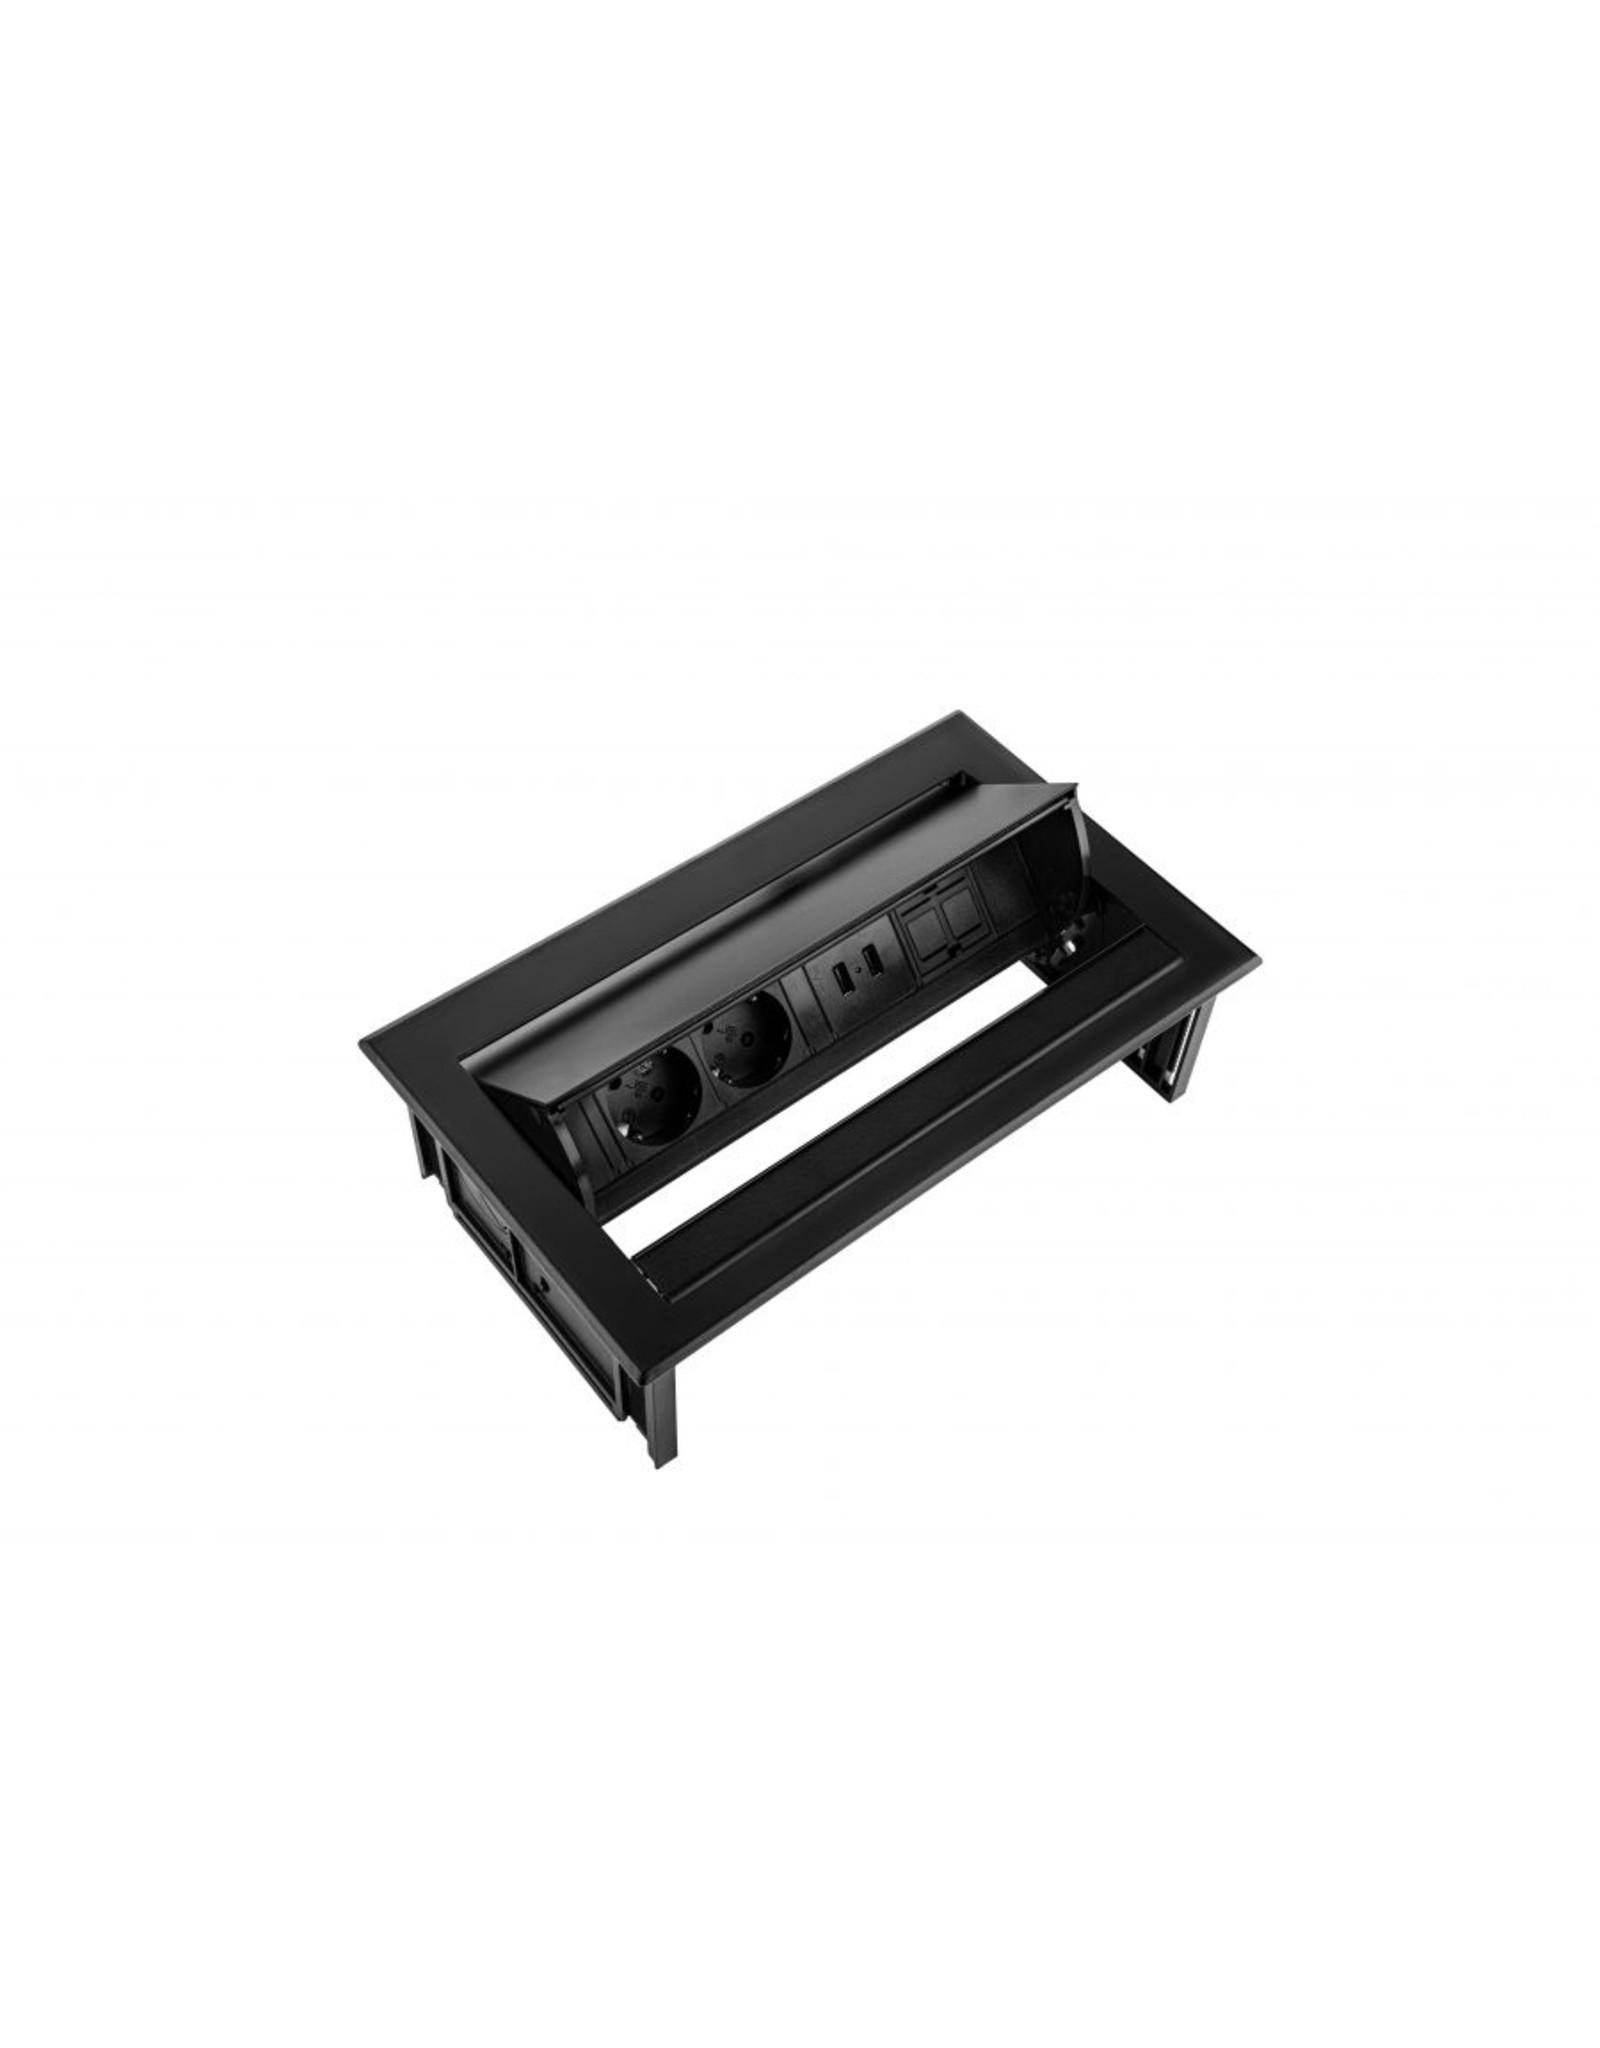 Ergo Power Desk In - 2x 230V - 2x USB charger -1x Keystone